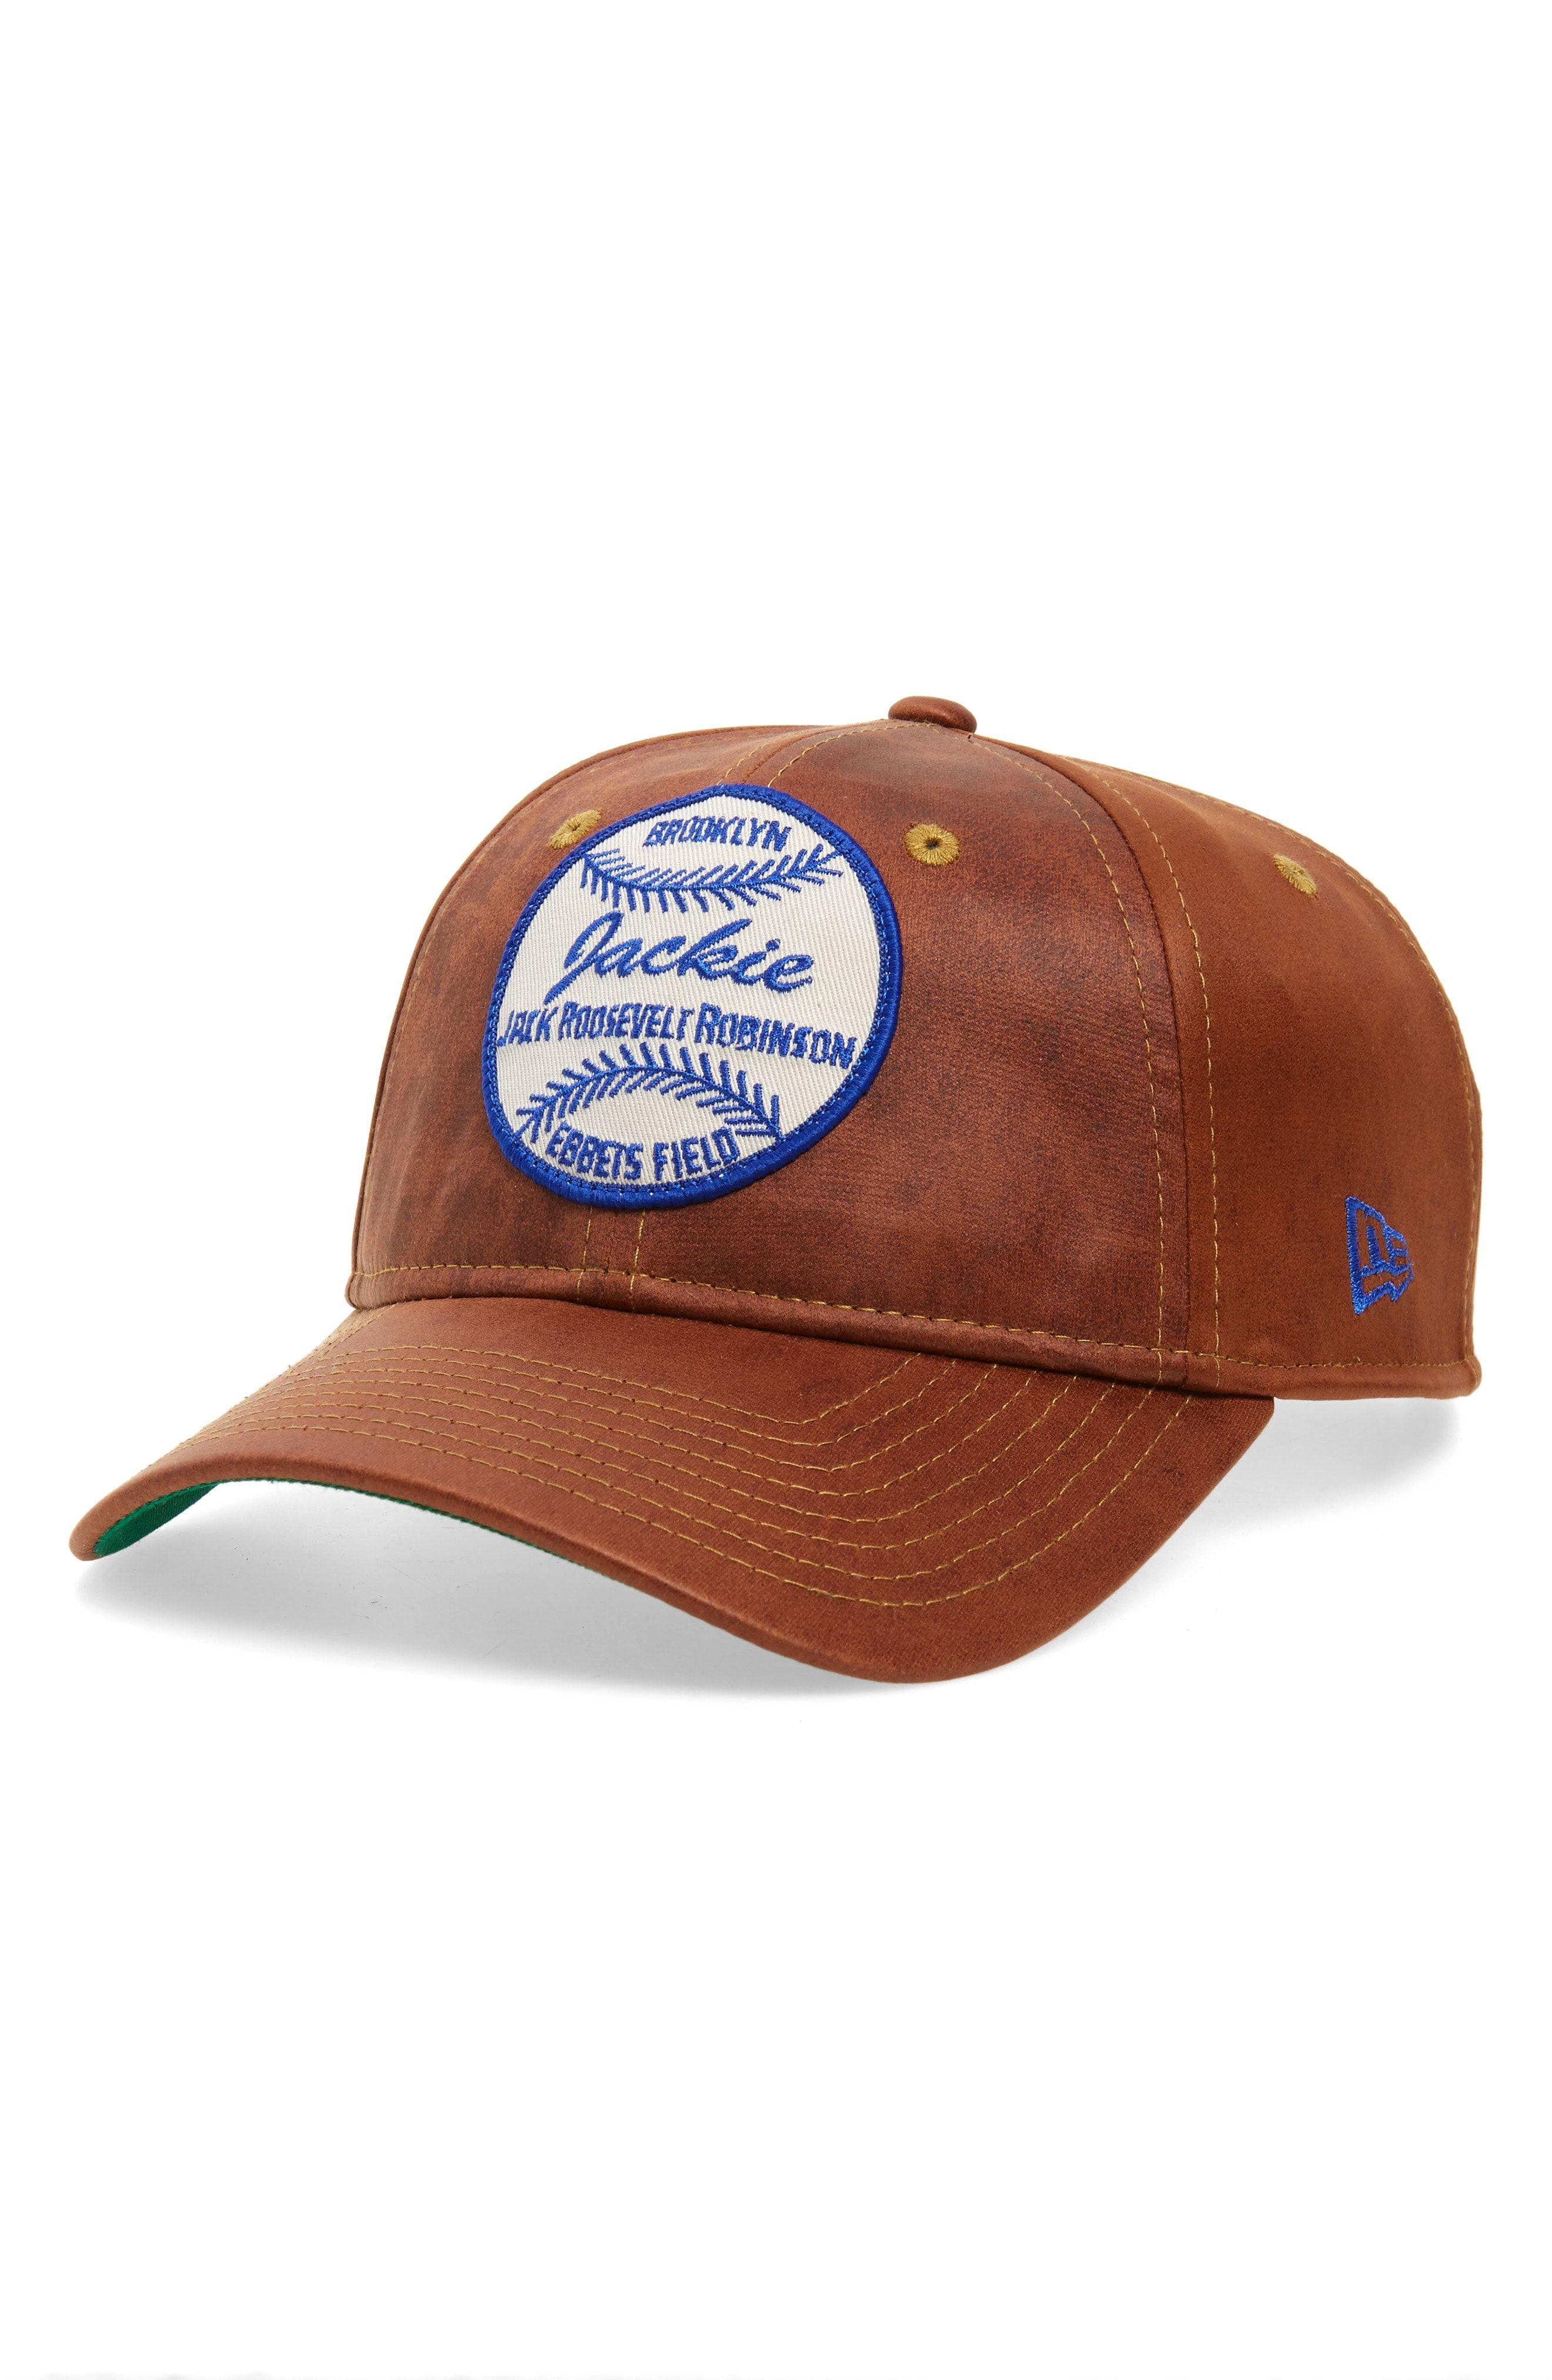 huge selection of picked up order online NEW ERA JACKIE ROBINSON 9TWENTY BASEBALL CAP - BROWN. #newera ...